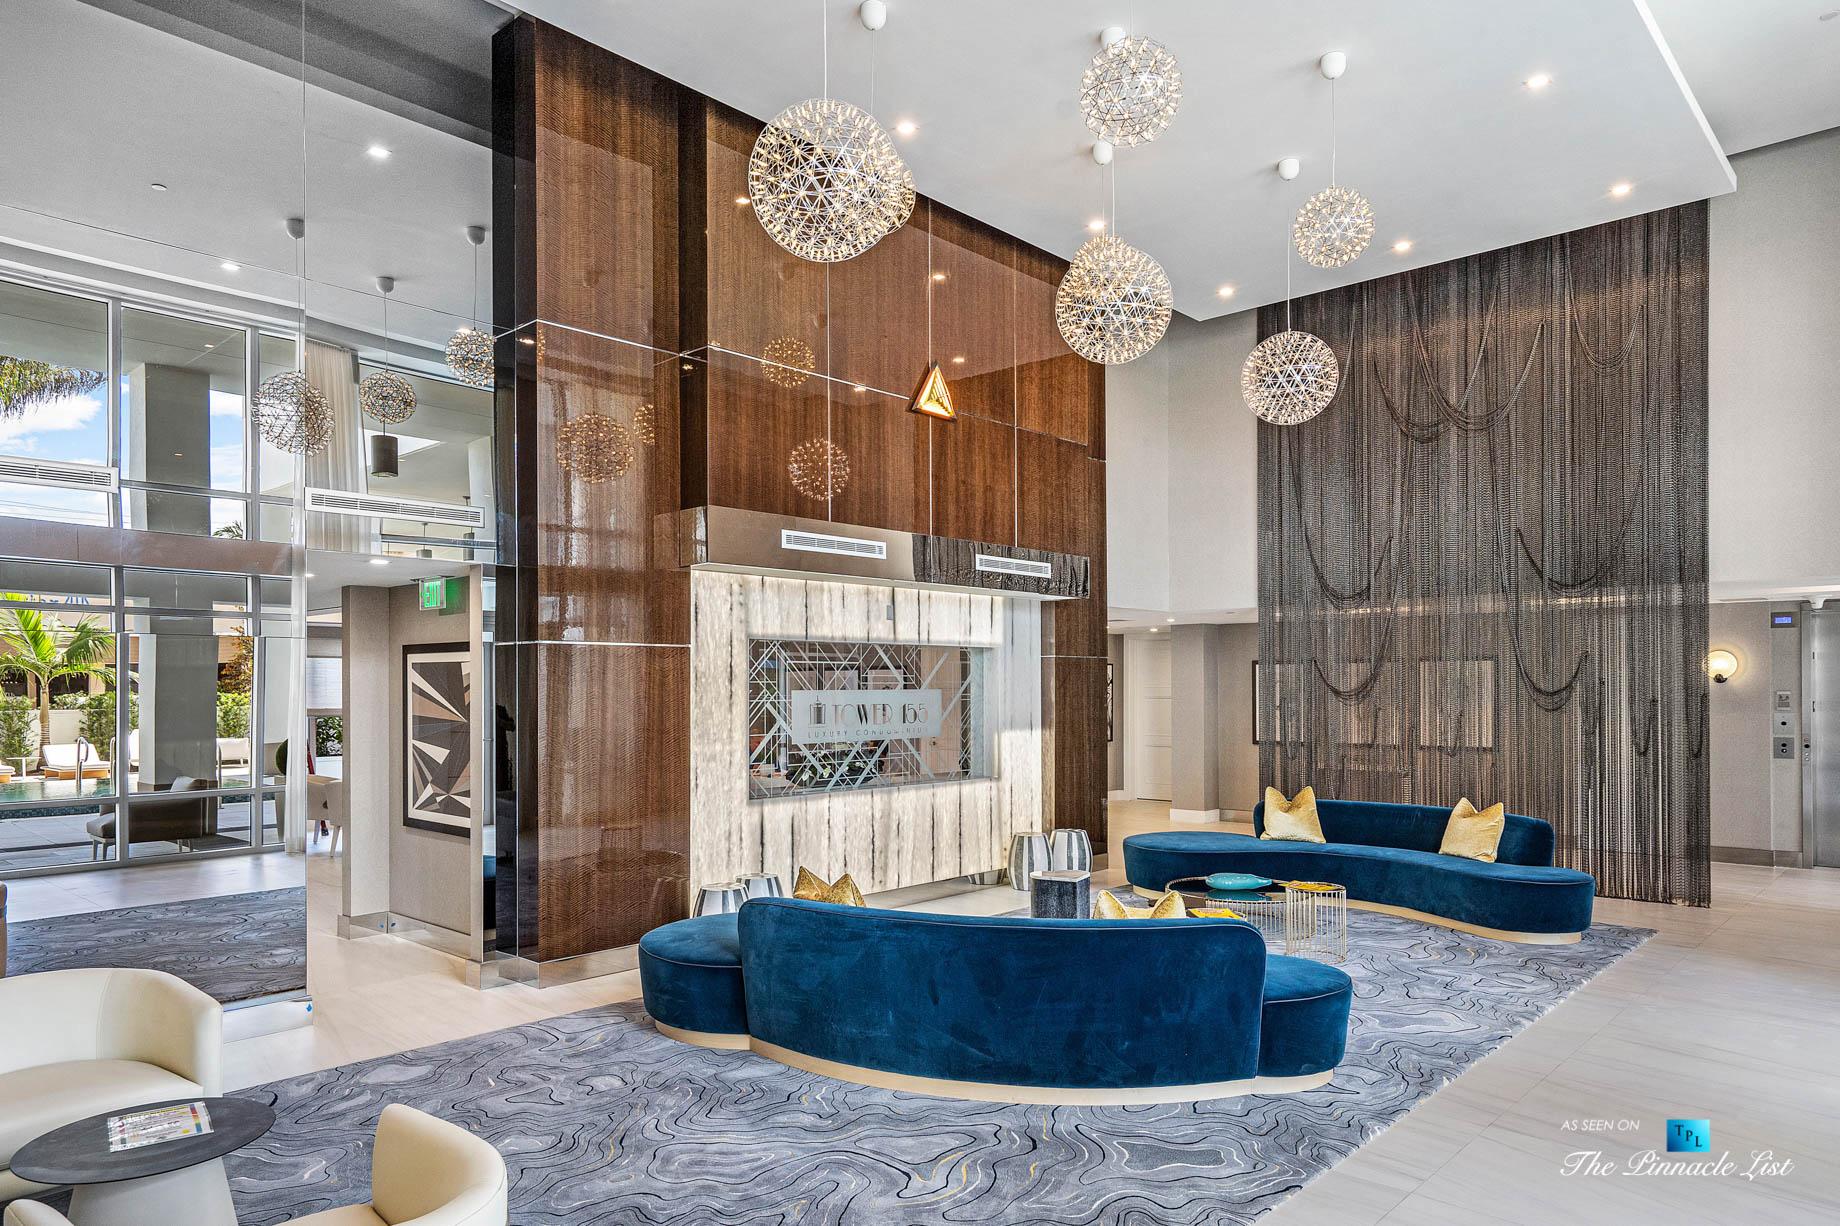 Boca Tower 155 Luxury Condo – Unit 416, 155 E Boca Raton Rd, Boca Raton, FL, USA – Lobby